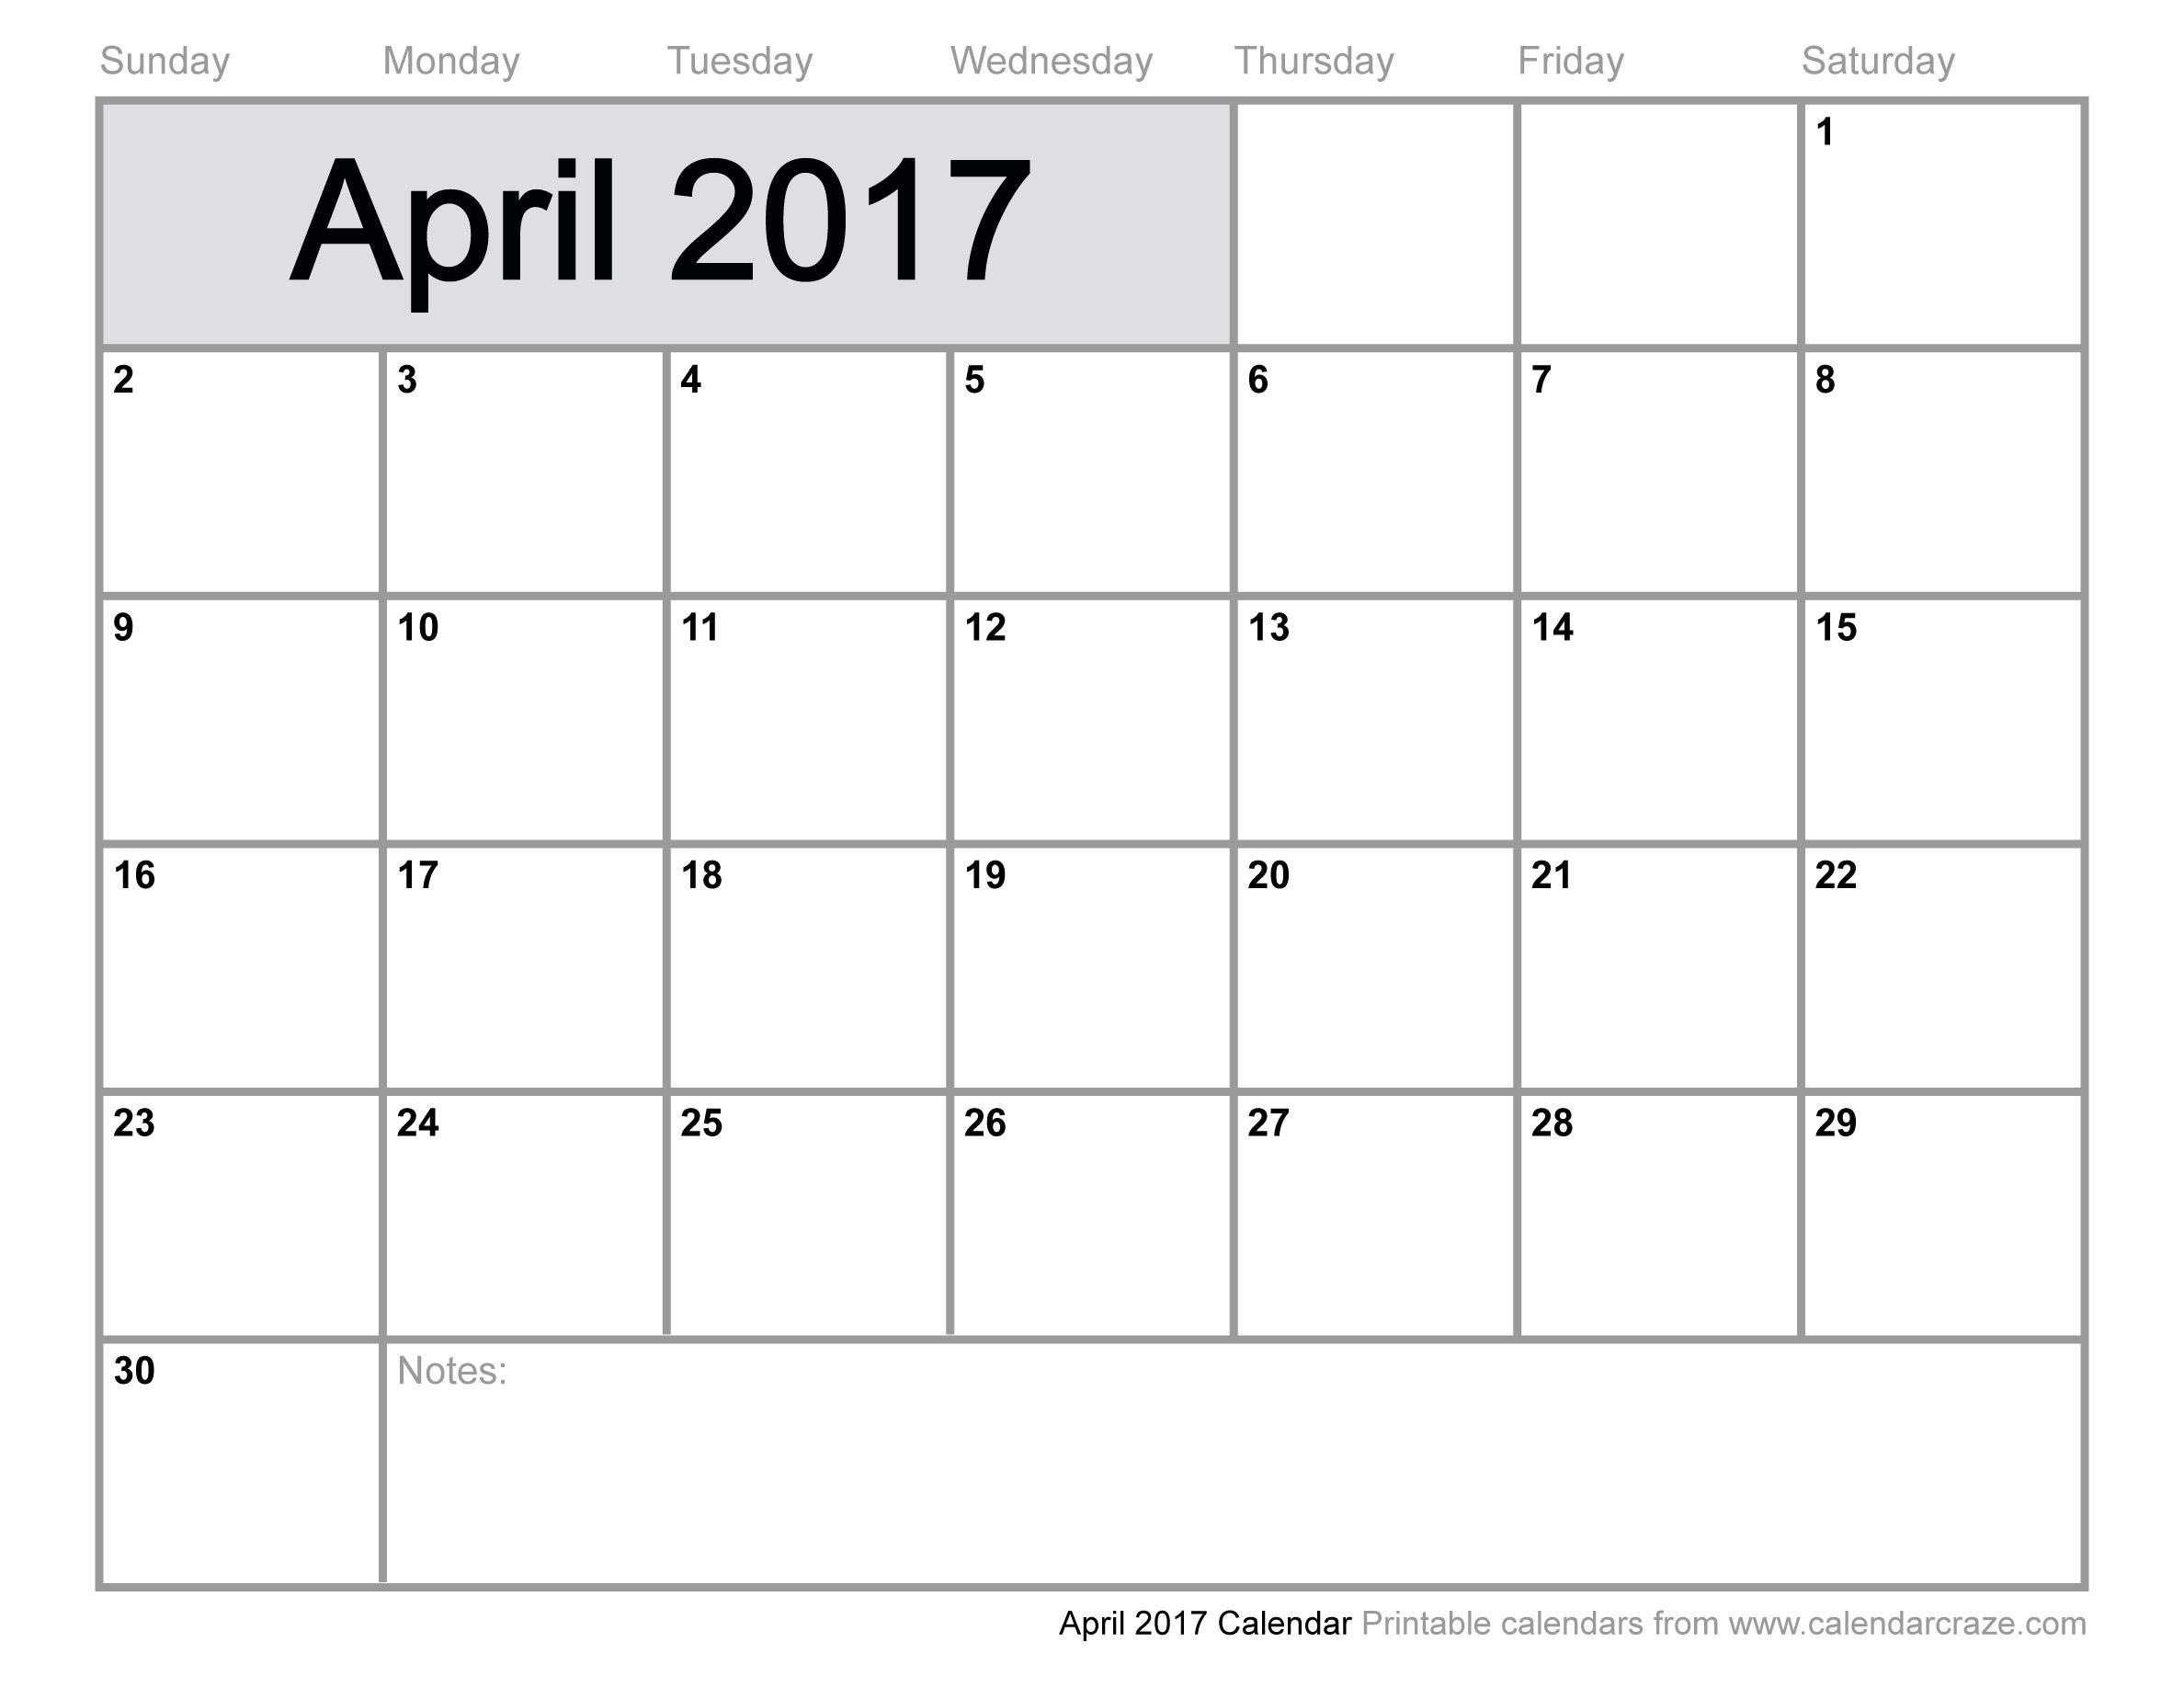 Free April 2017 Calendar (With US Holidays) – Printable Calendar